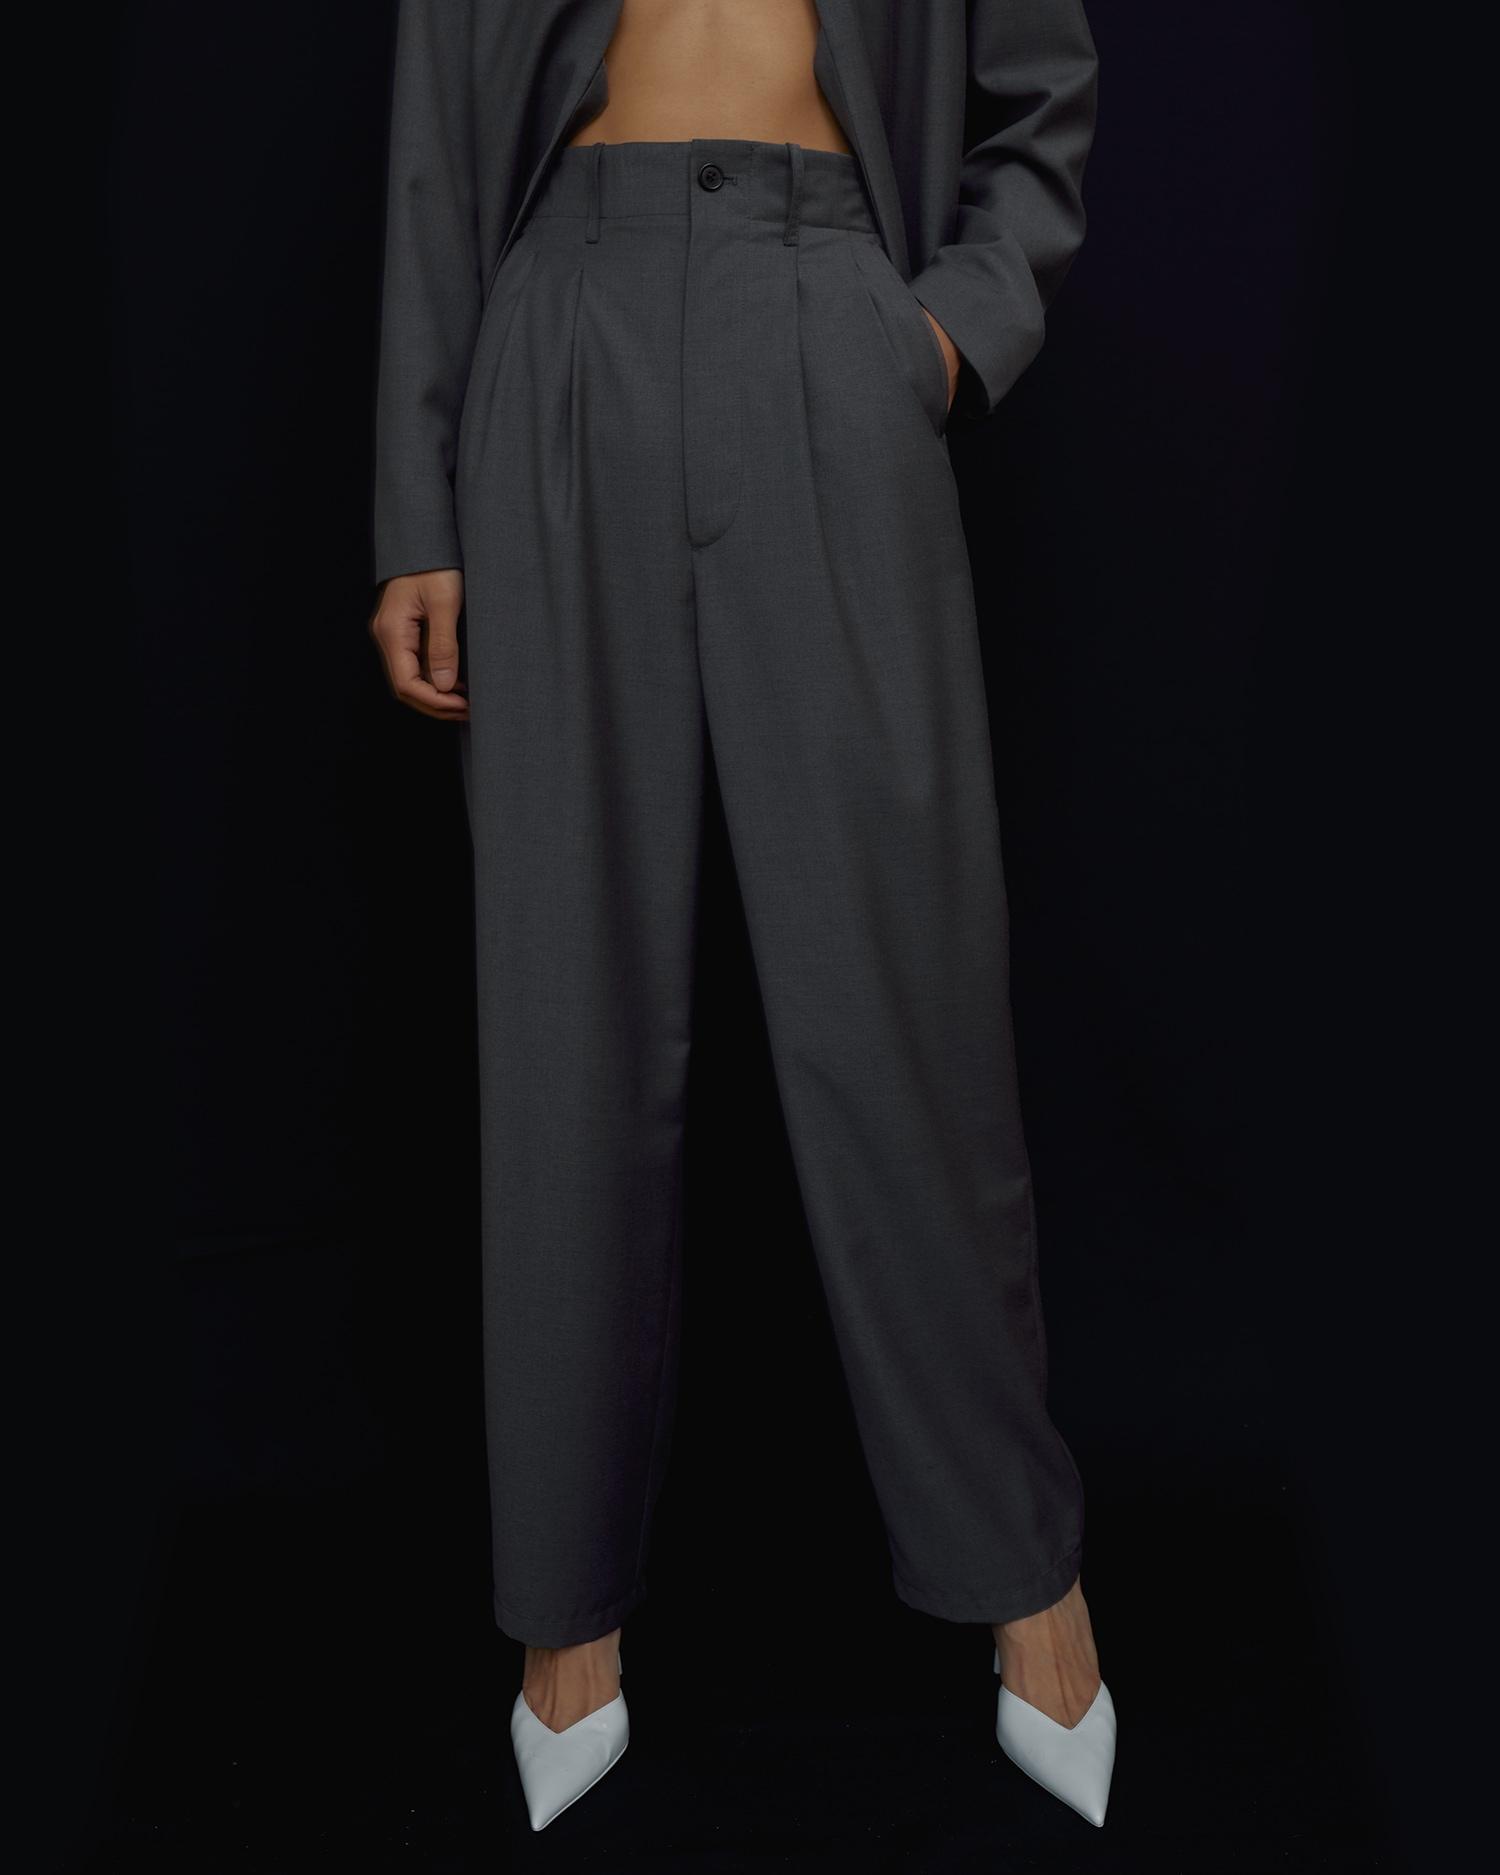 Shop Designer Womenswear, Menswear And Gender-Neutral Basics